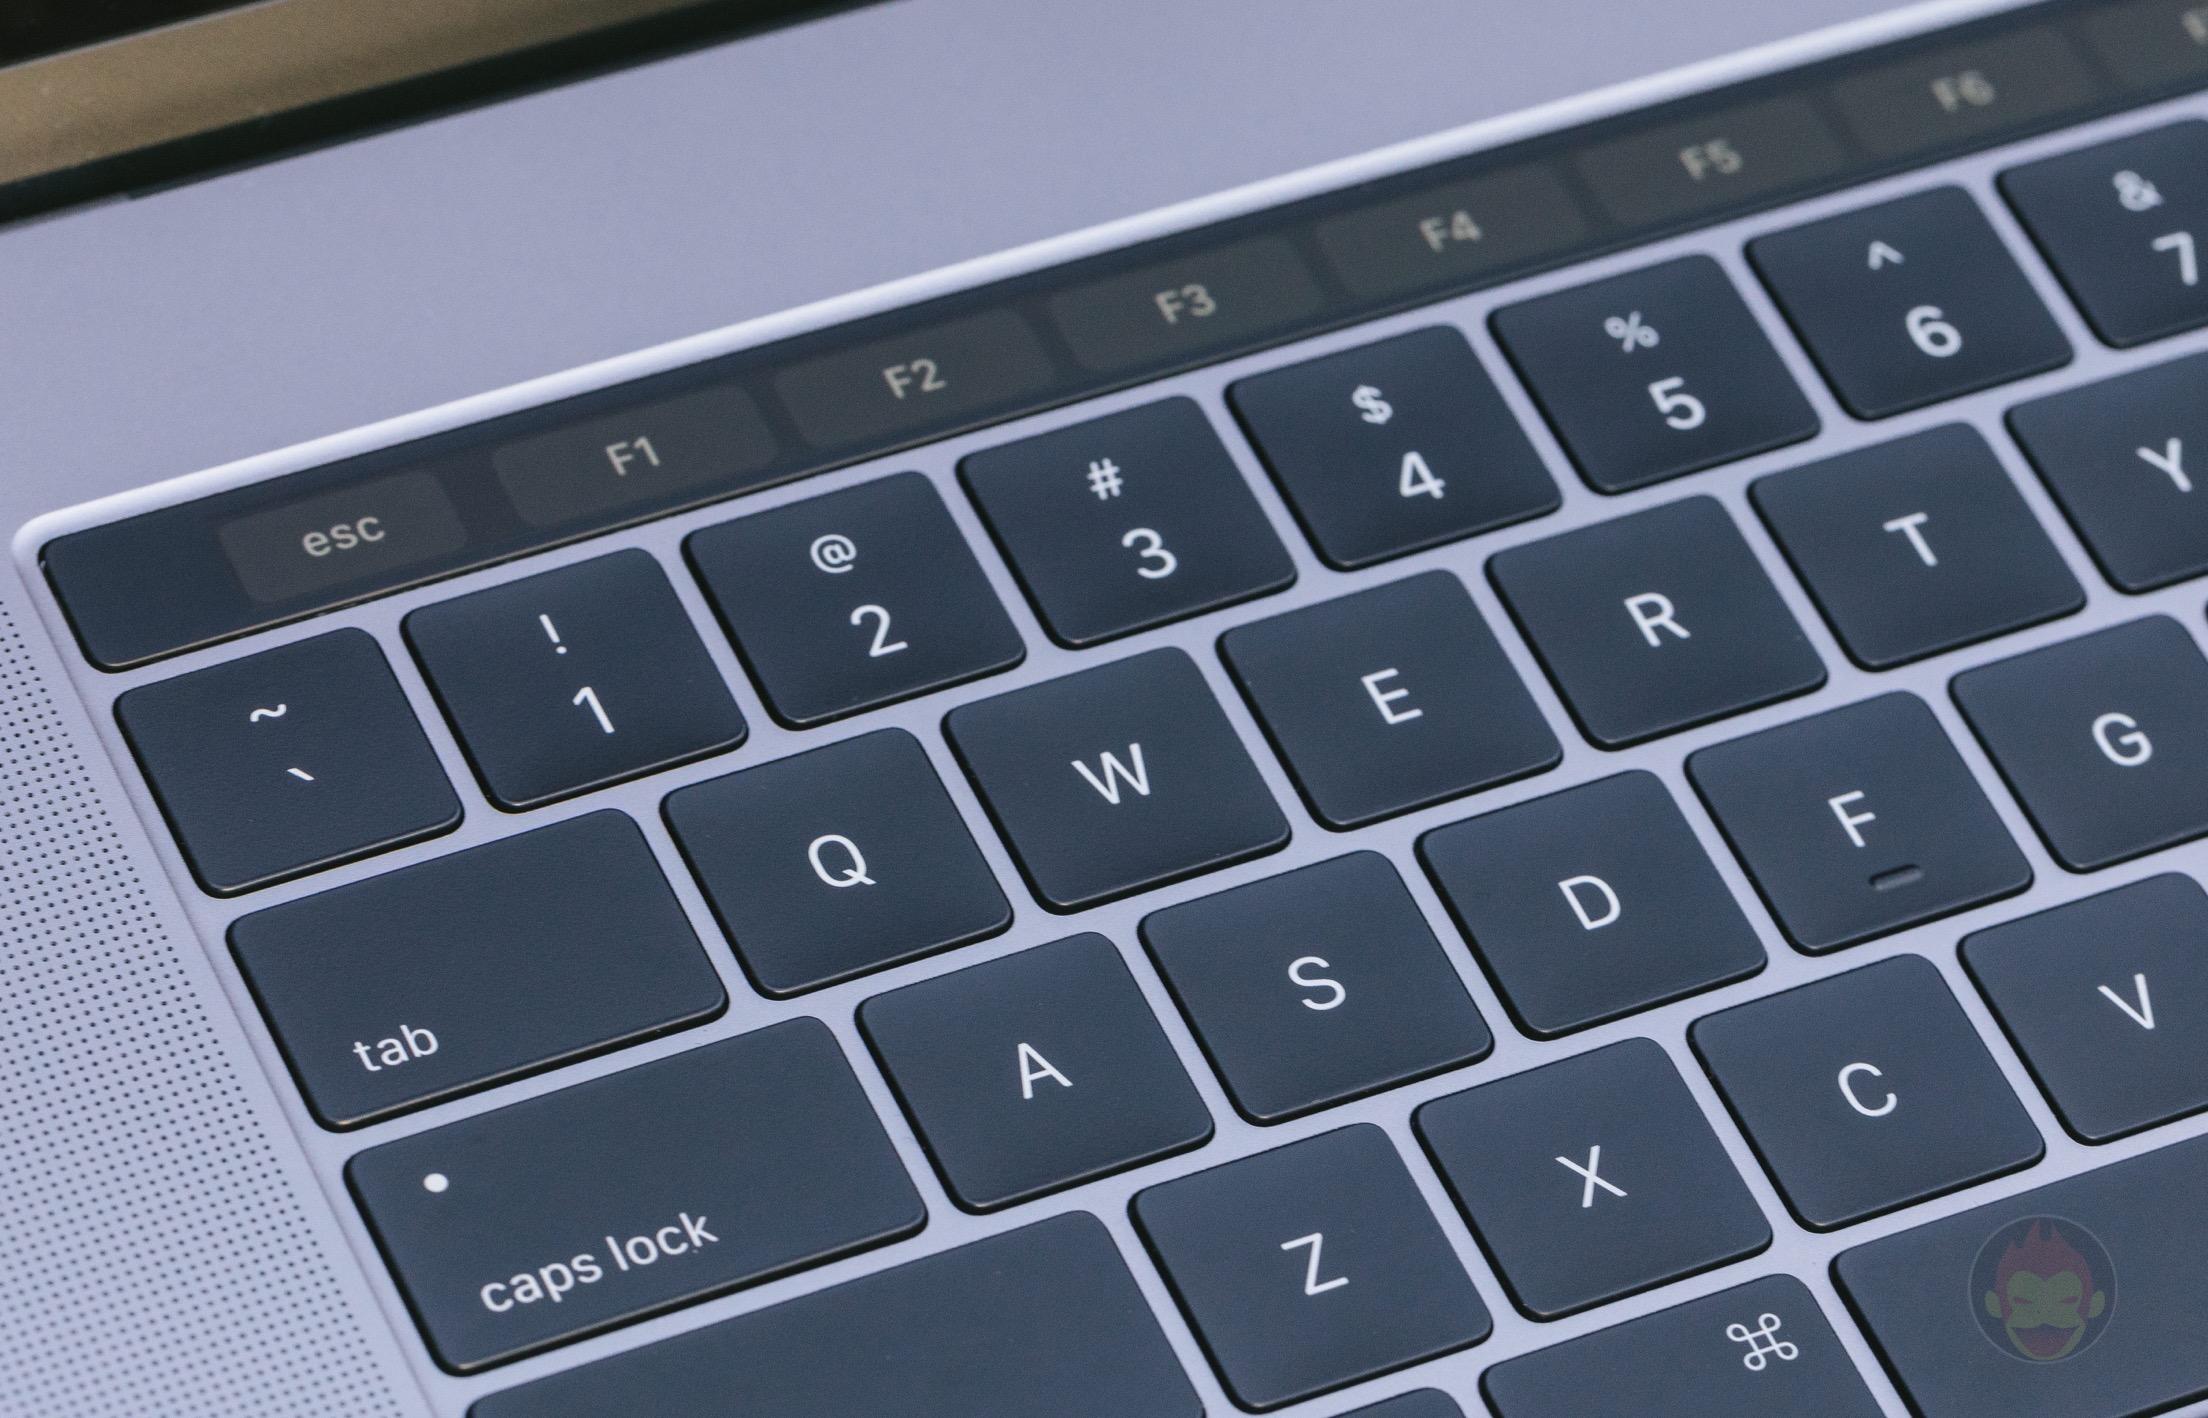 MacBook-Pro-Late2016-15inch-model-photos-14.jpg